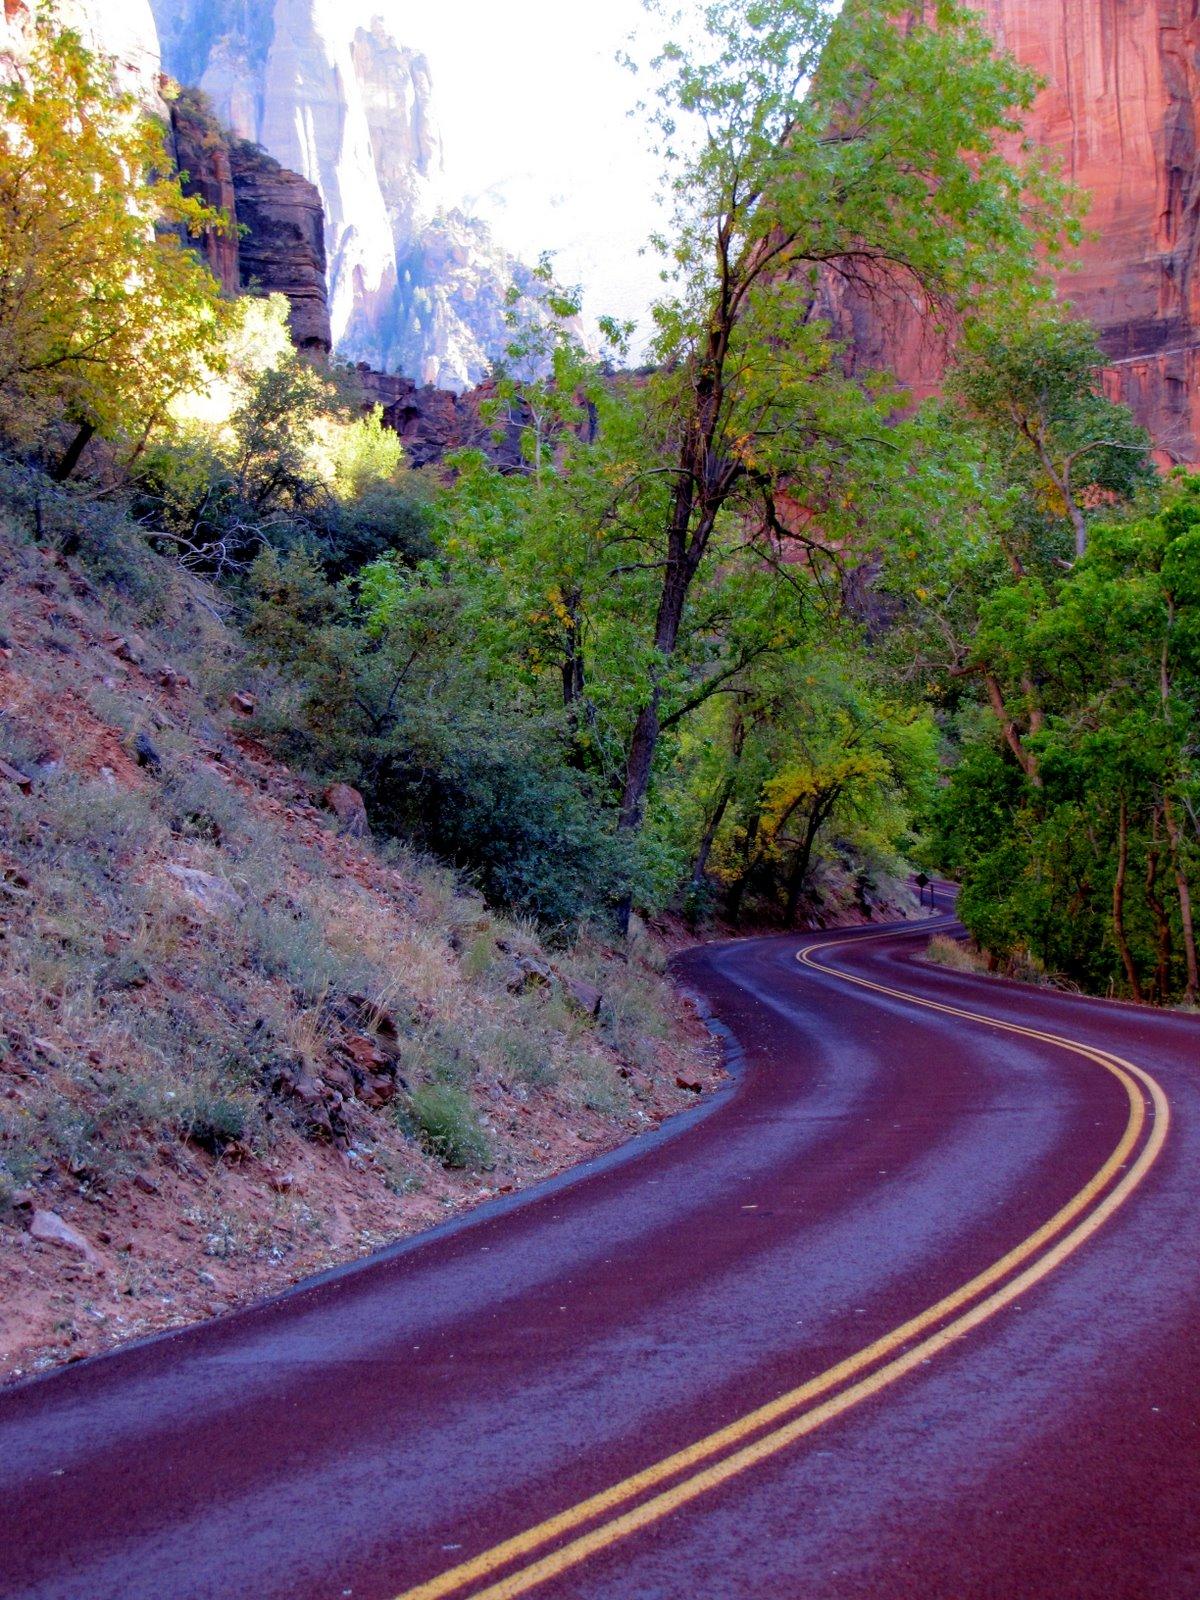 Kanyargós  Curving road